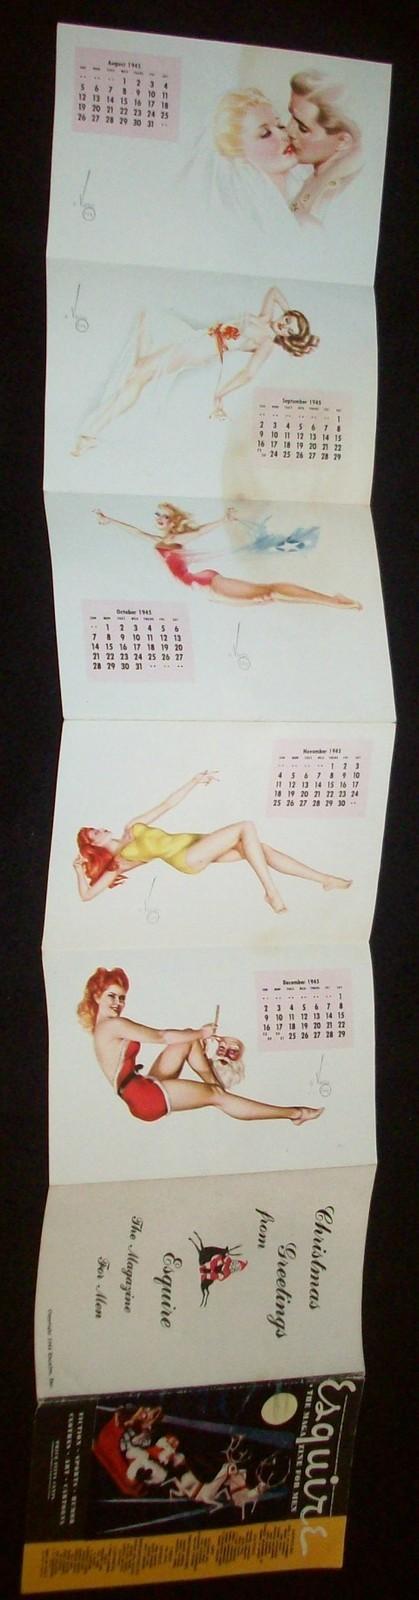 esquire pullout calendar2